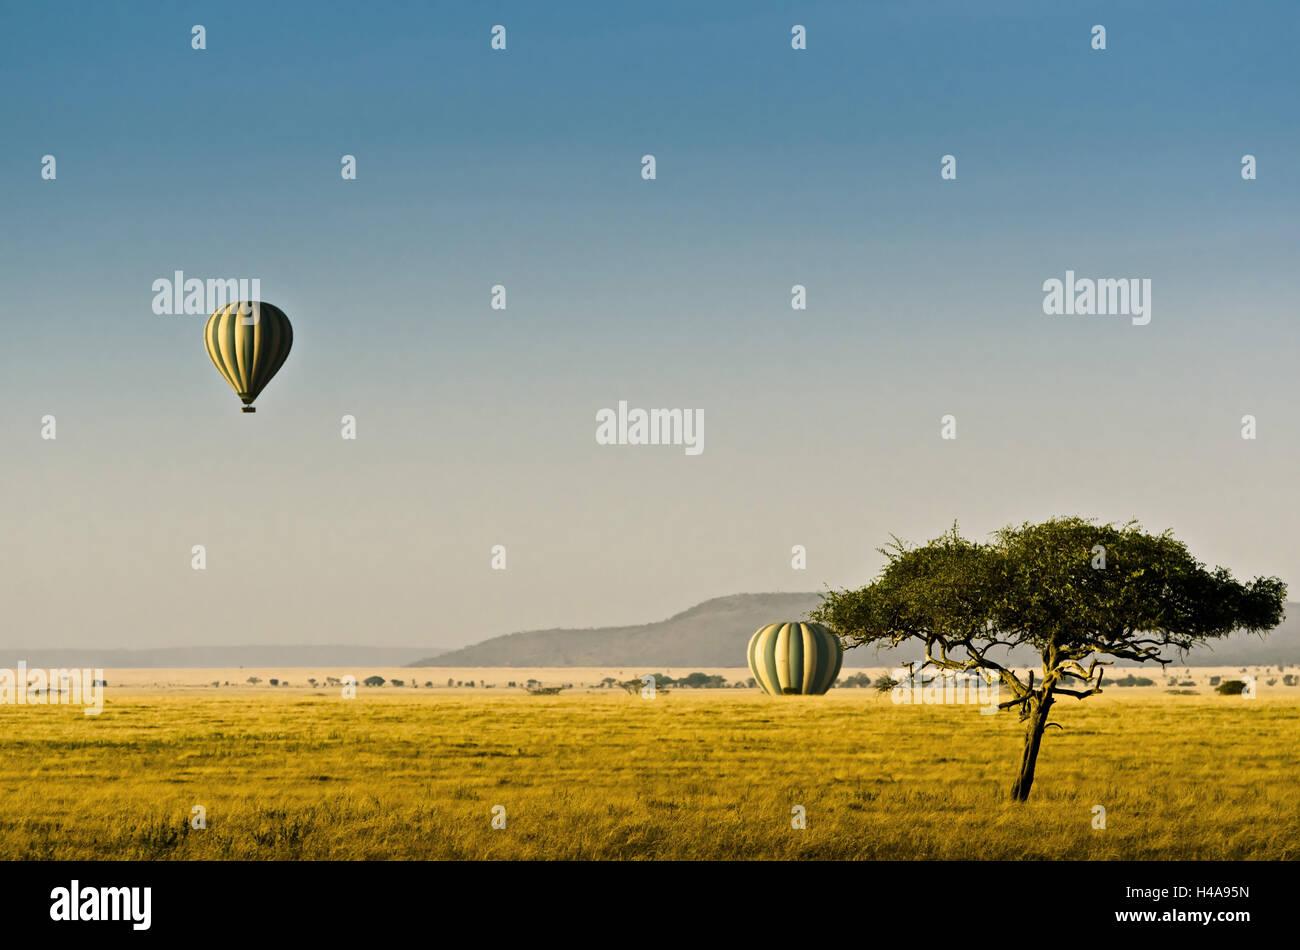 Africa, Tanzania, East Africa, Serengeti, national park, balloon, hot-air balloon, balloon ride, Stock Photo